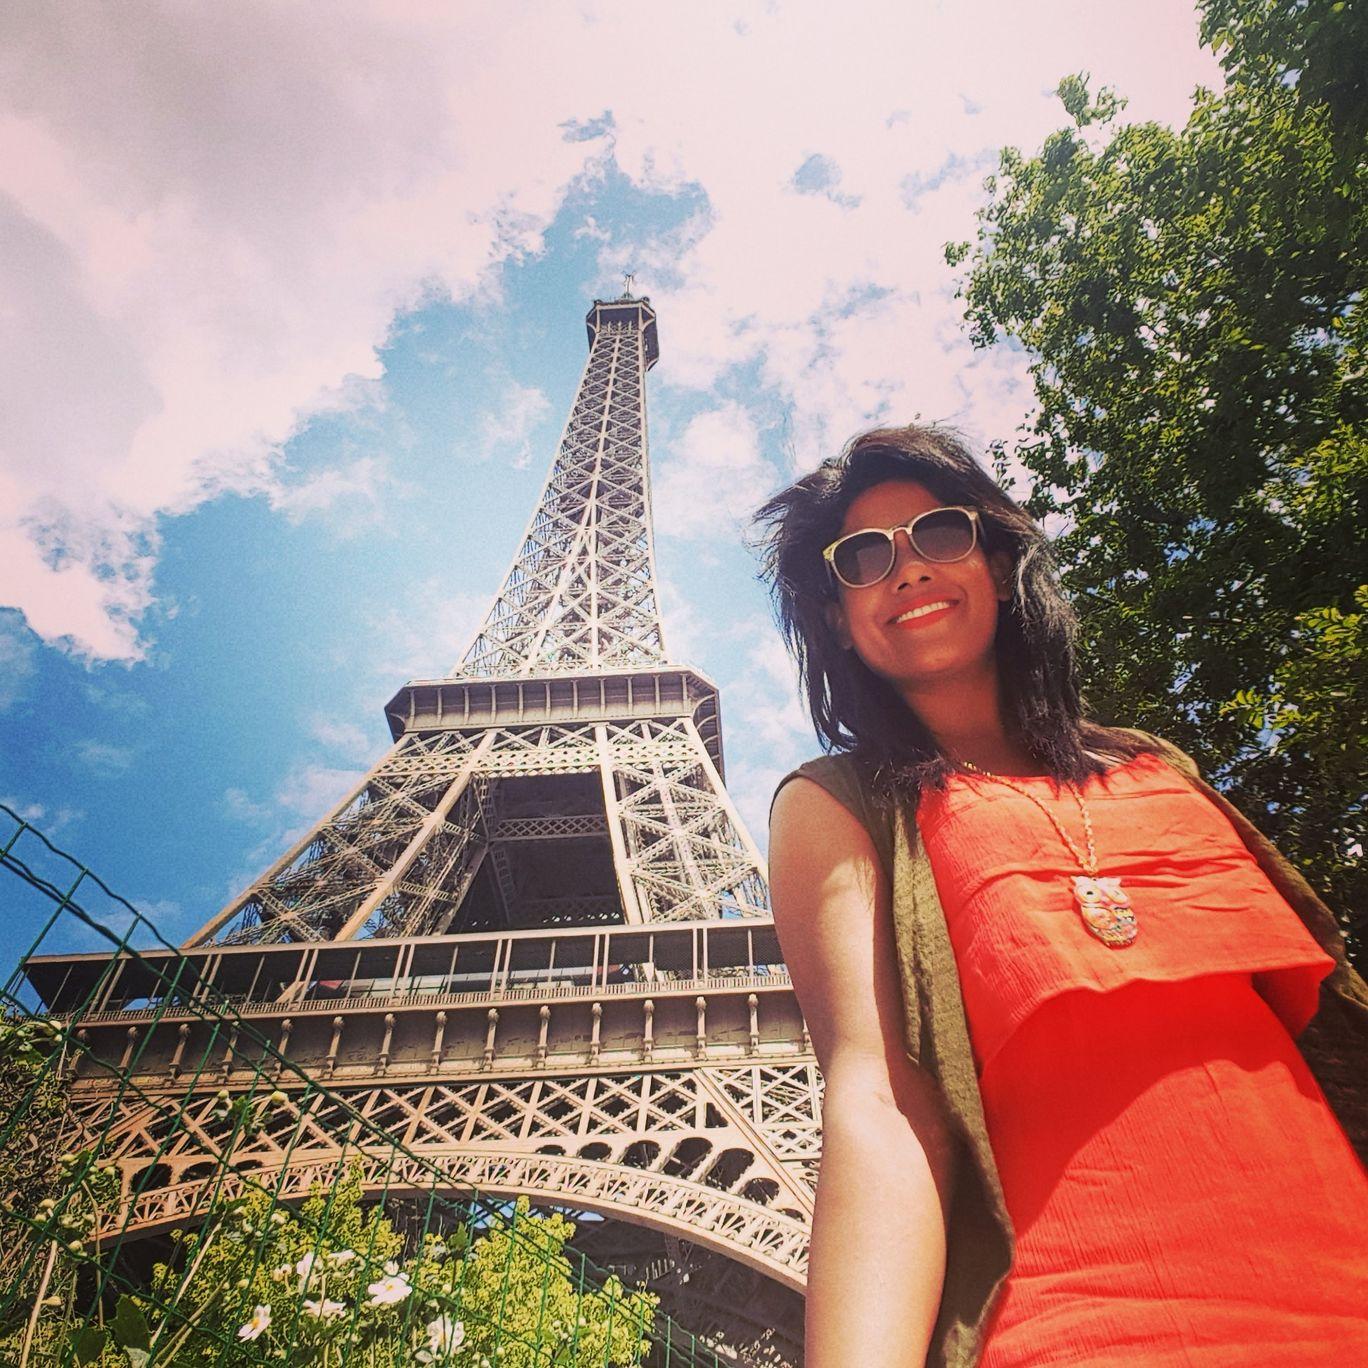 Photo of Eiffel Tower By Aparna De